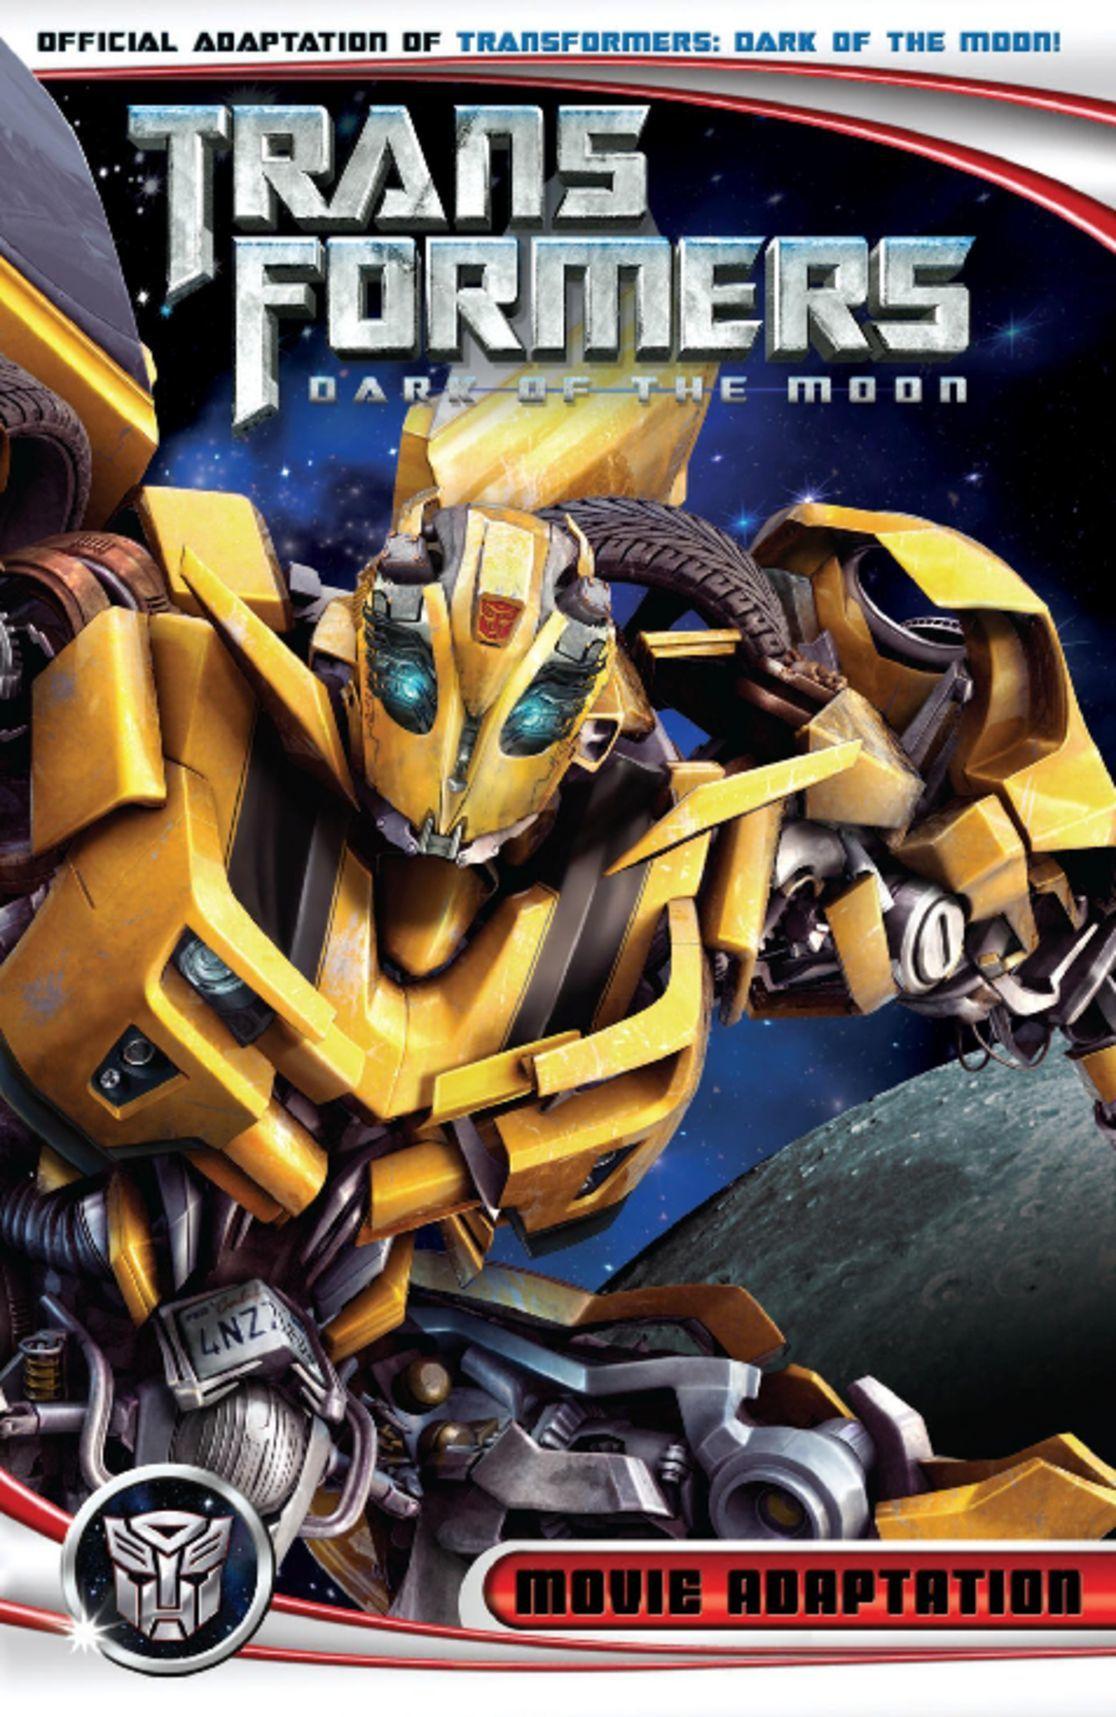 Transformers 3 Movie Adaptation Dark of the Moon Digital